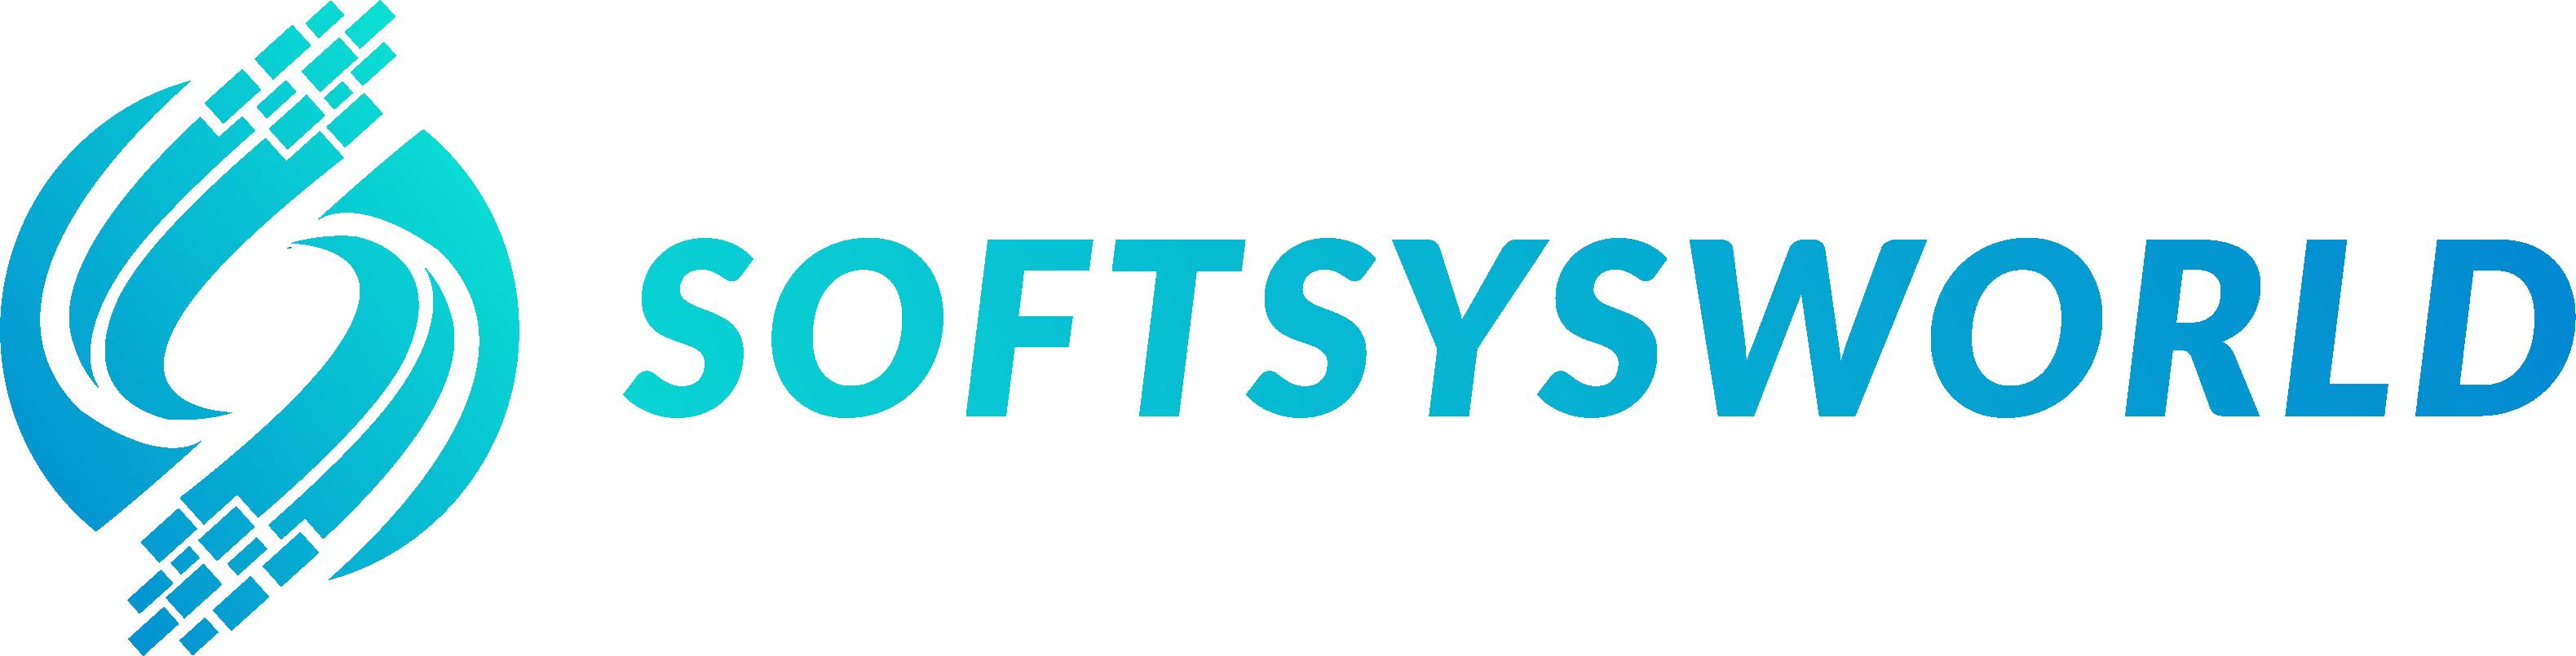 Softsysworld Technology Solutions LLC.